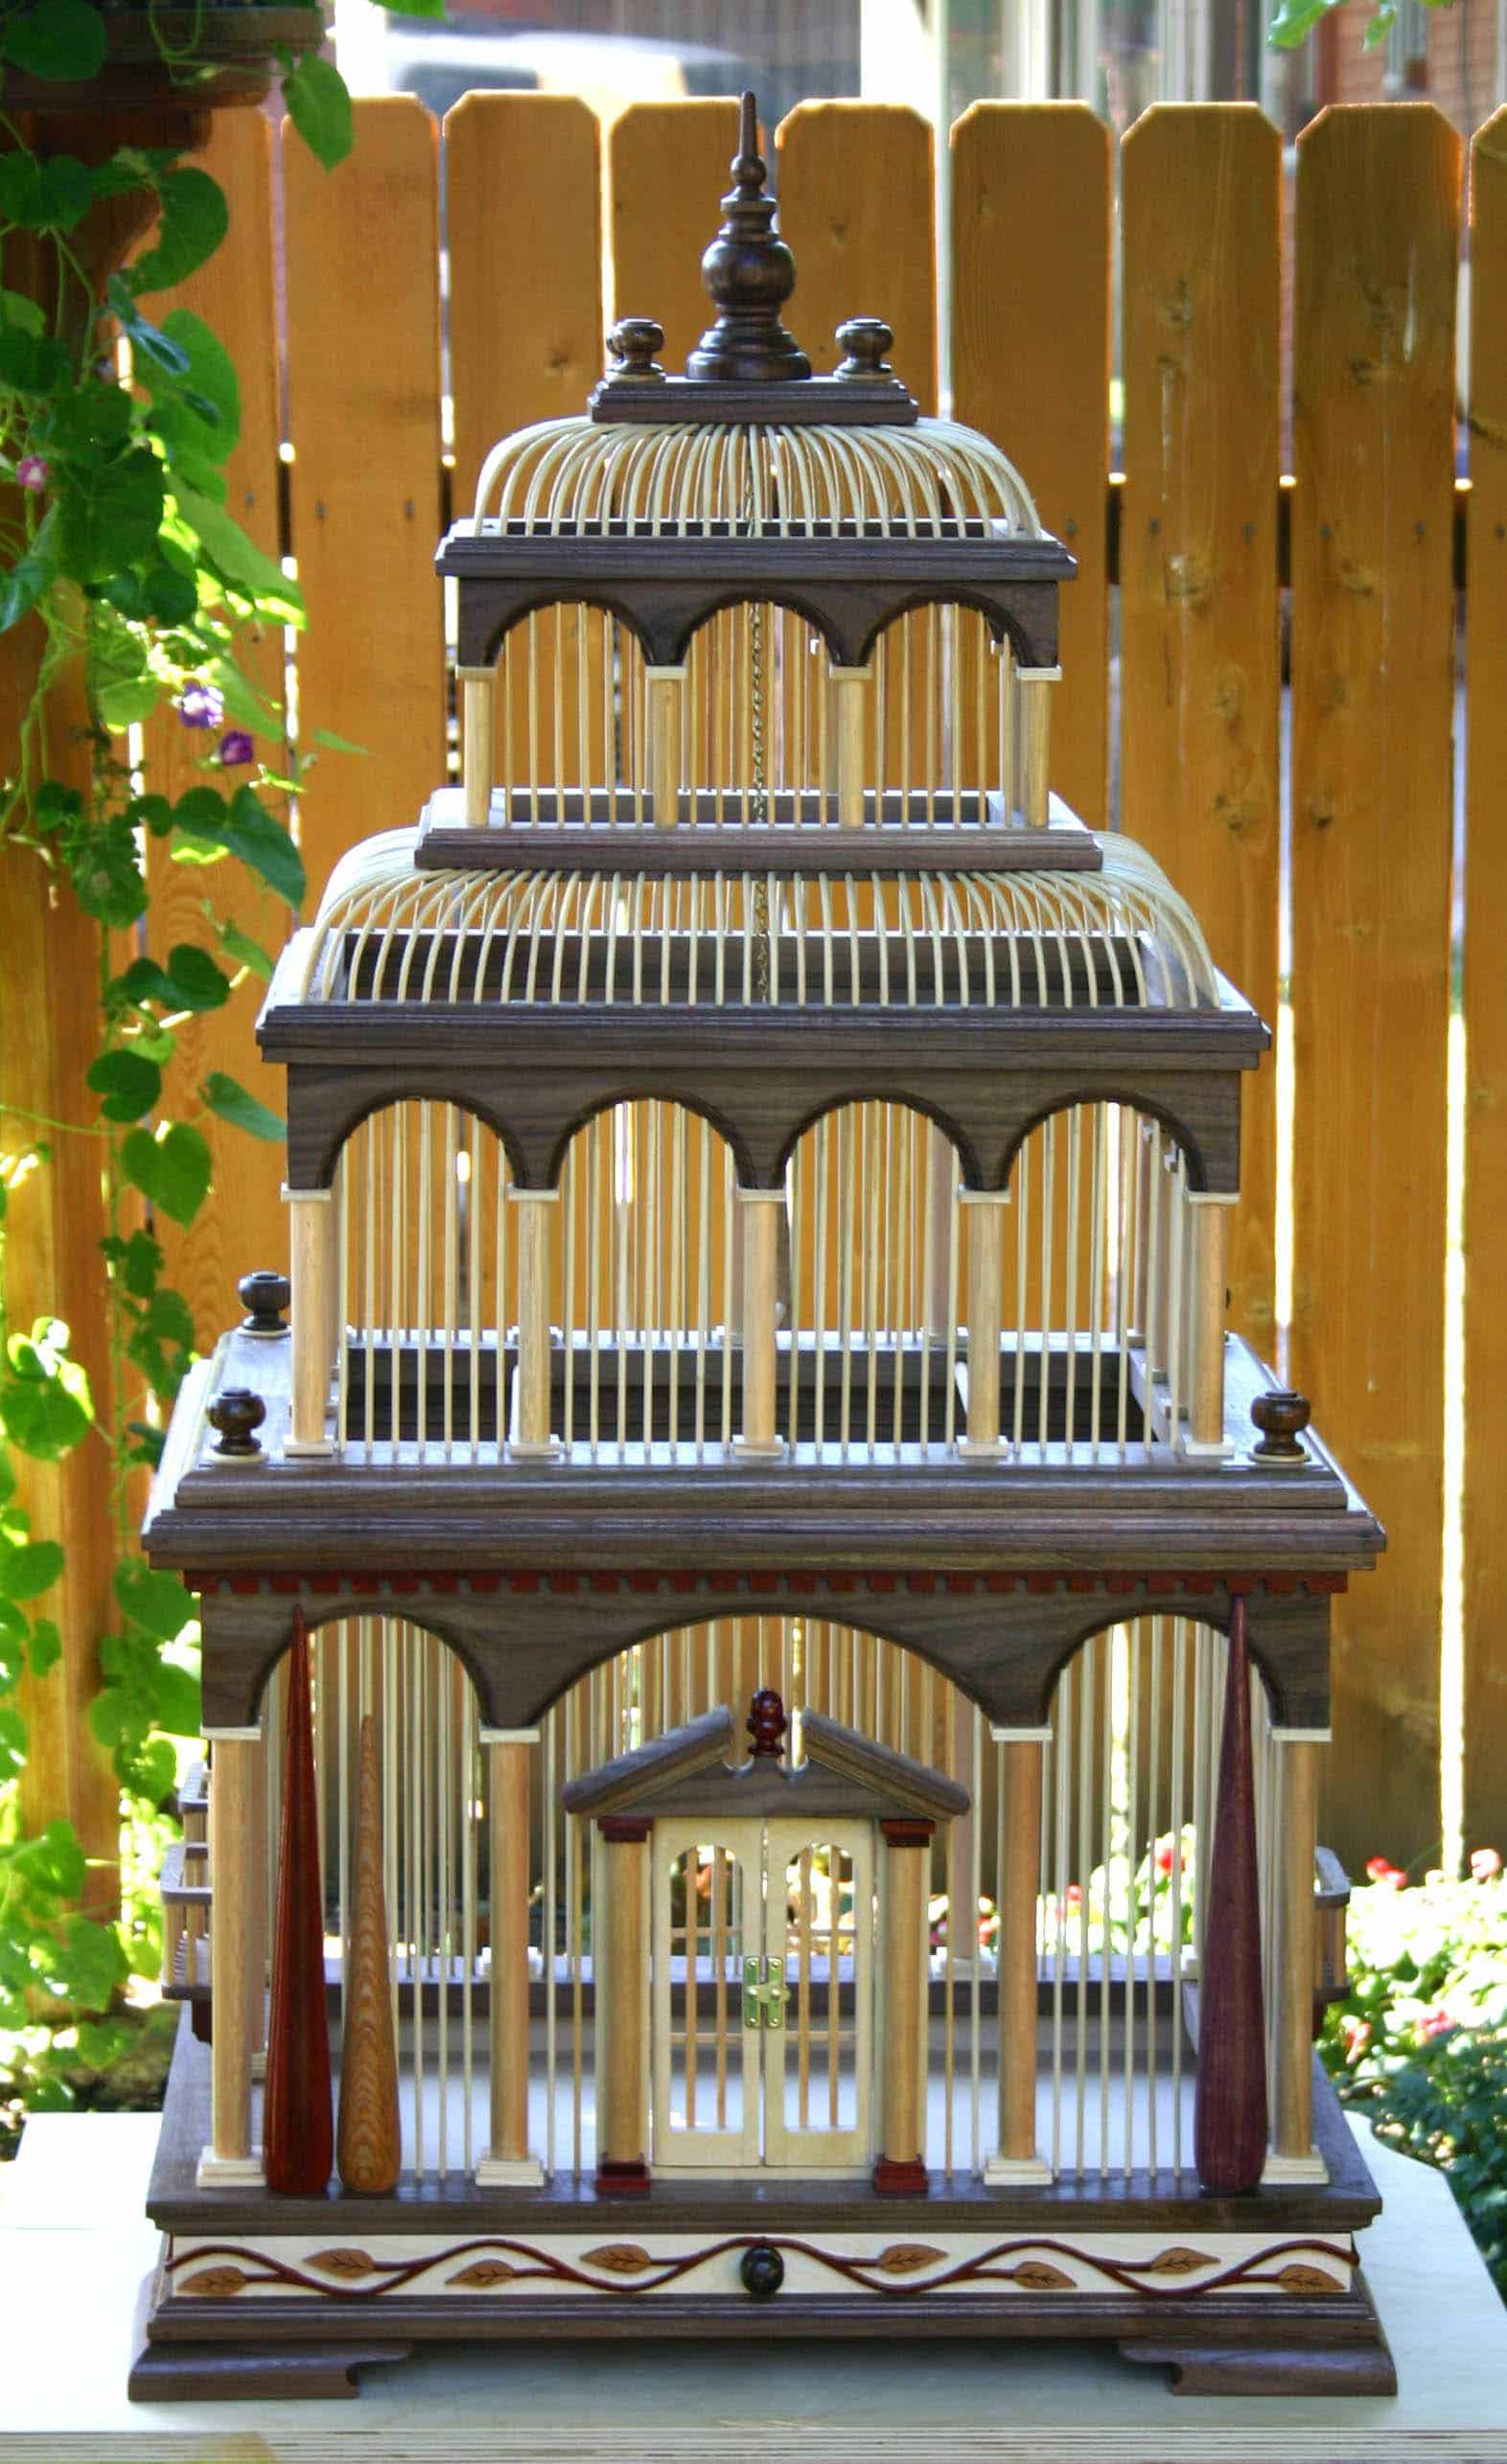 Venice-finished-A Bird House Plans Home Built on home built greenhouse plans, home modern modular prefab house, home built shed plans,